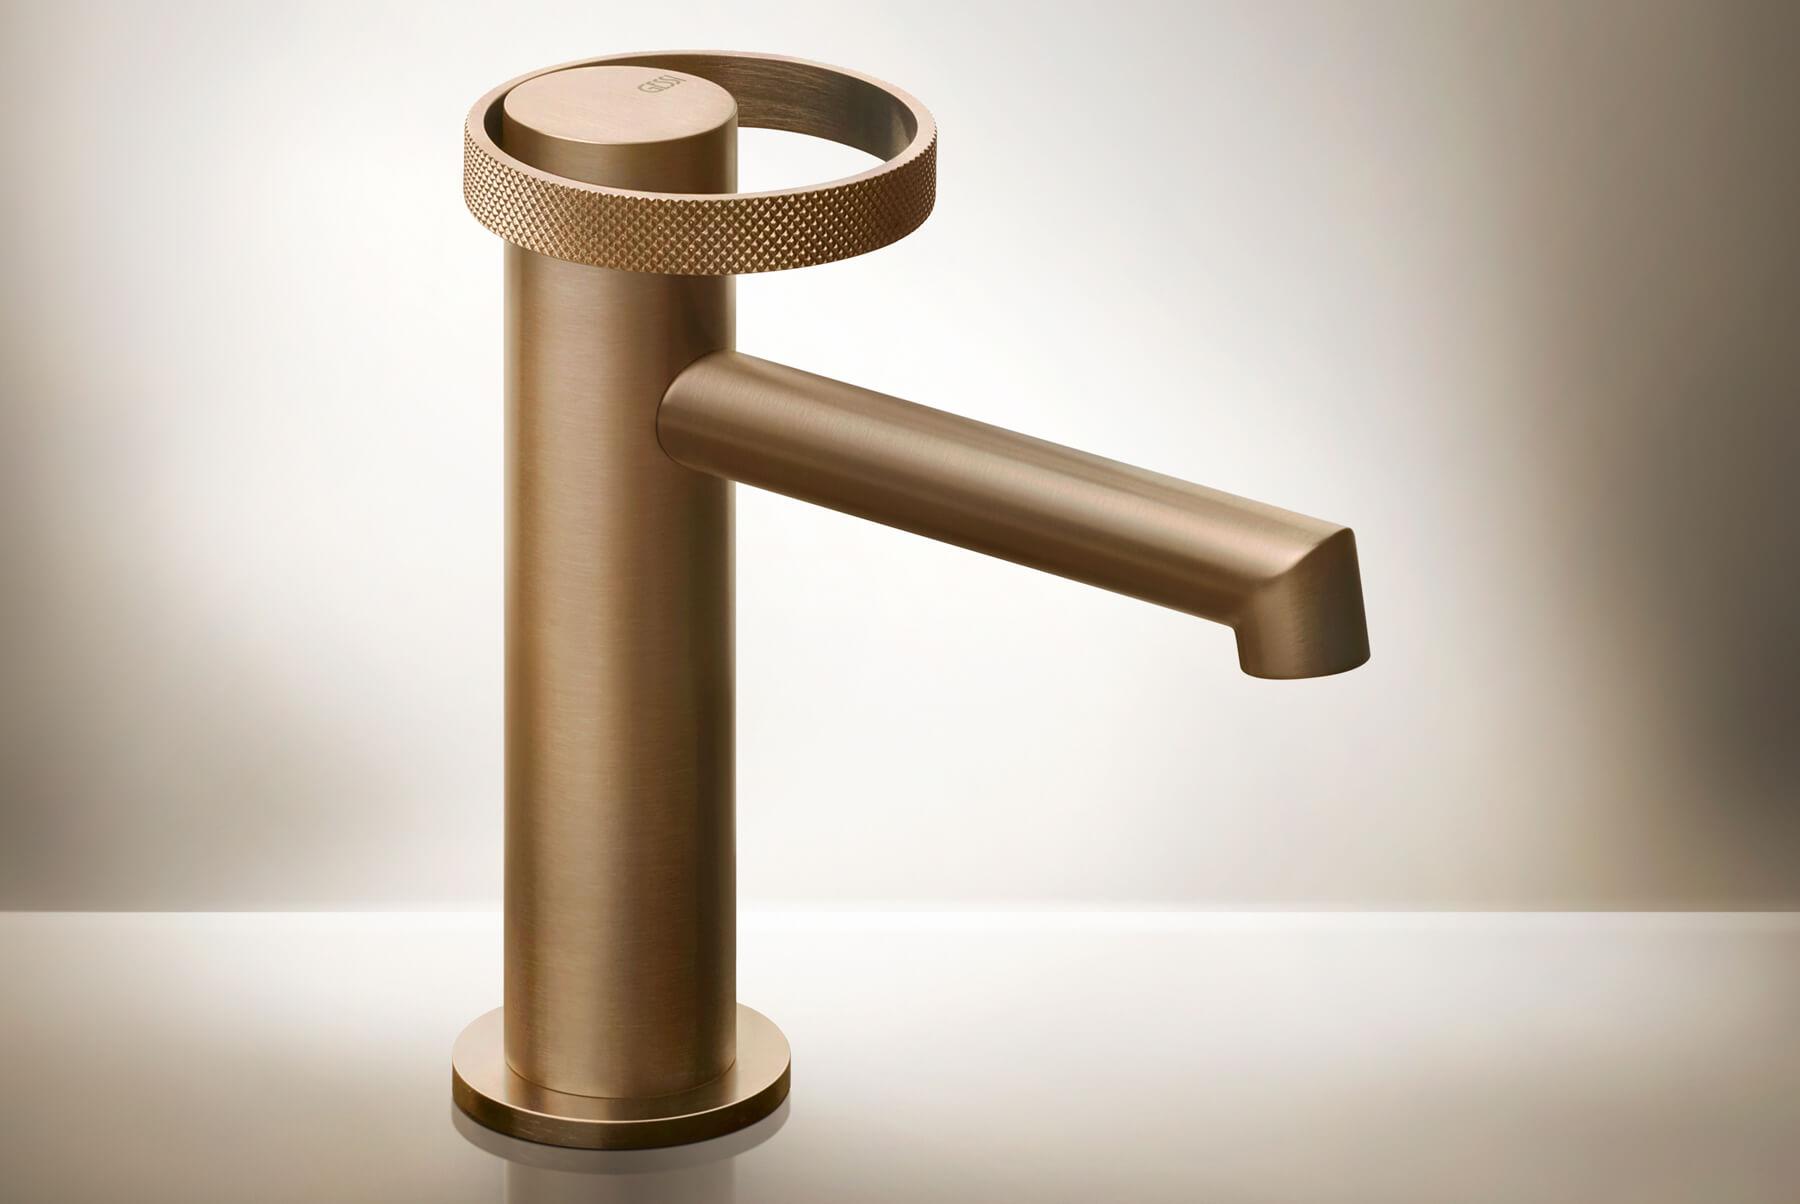 Brassware-GESSI-Anello-Inset-5-1800x1204